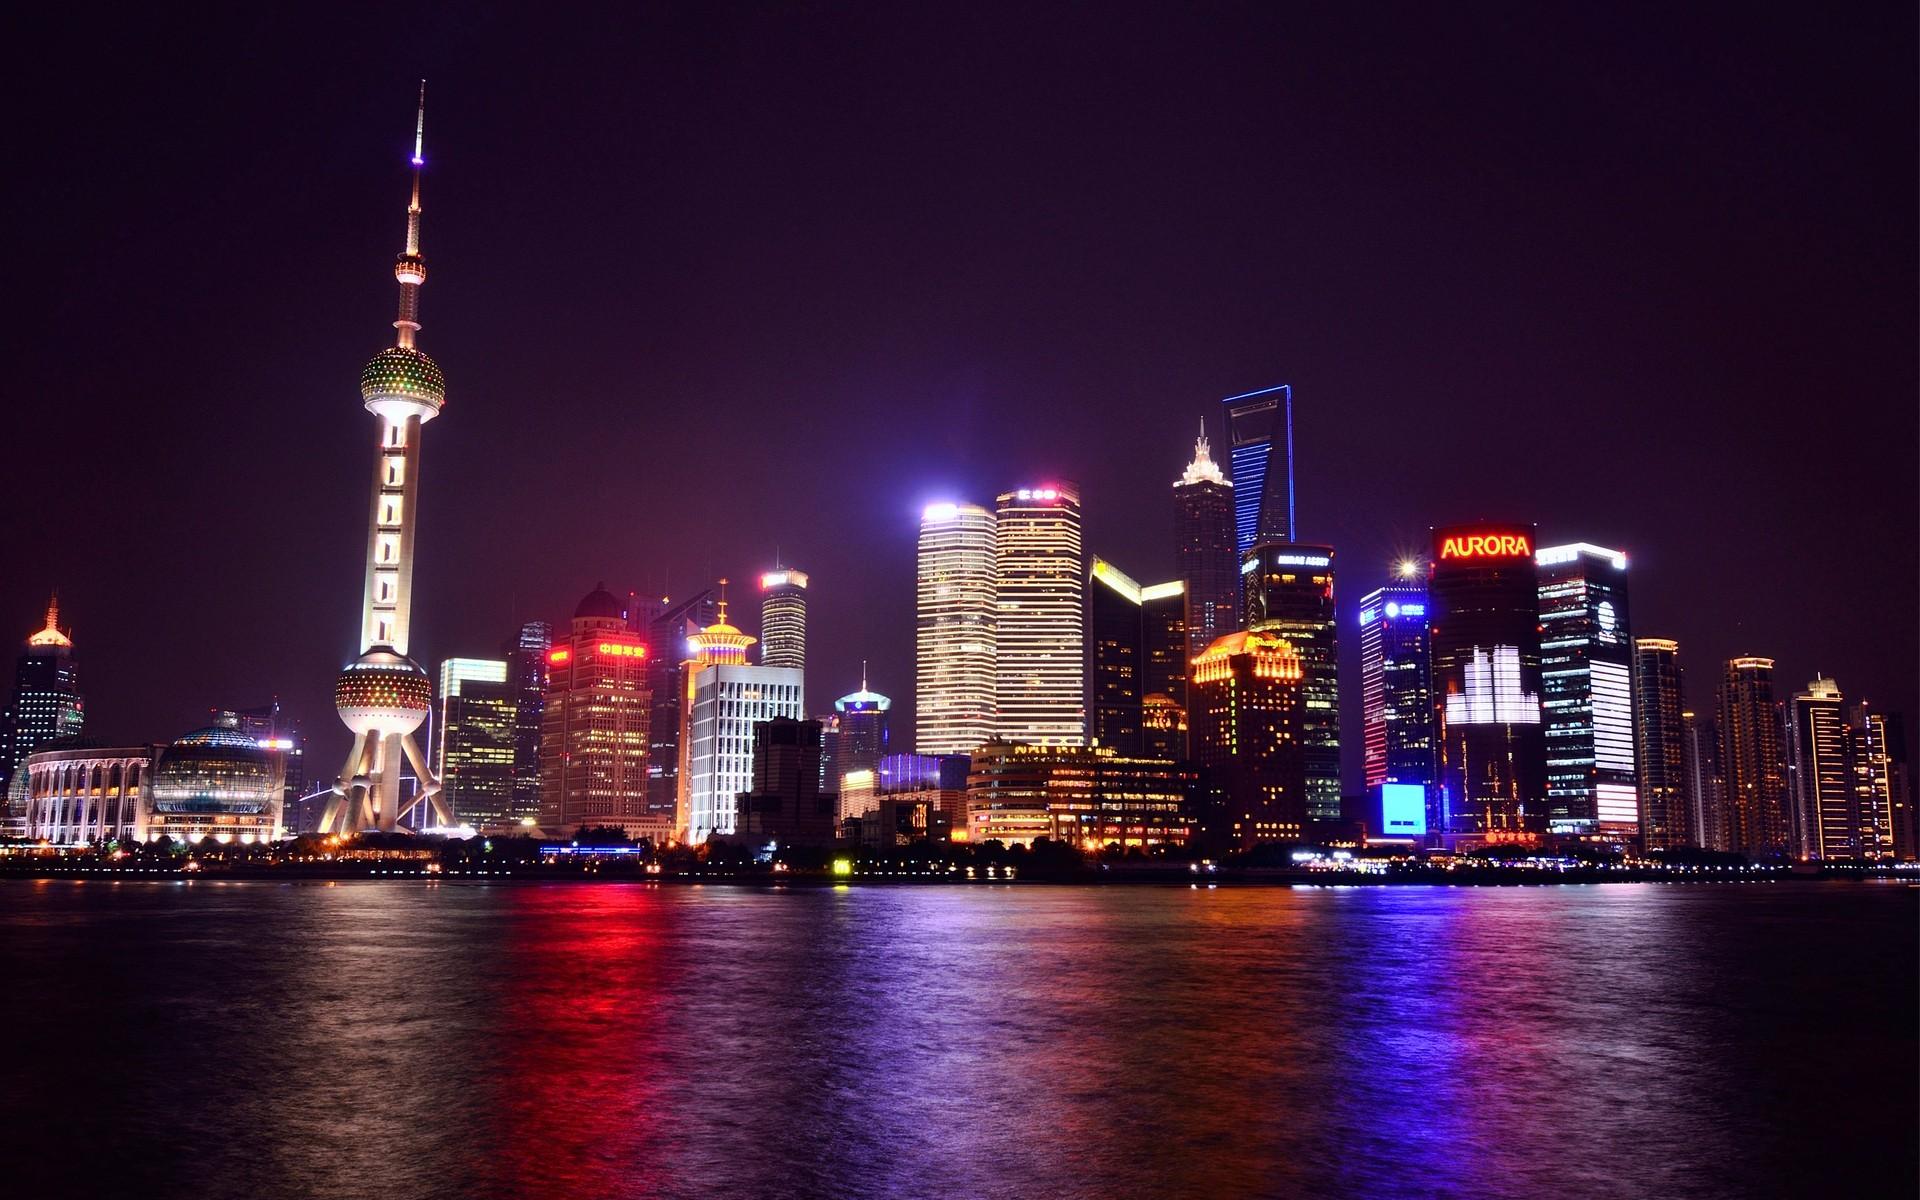 General 1920x1200 night city Shanghai skyscraper city lights Asia lights China water